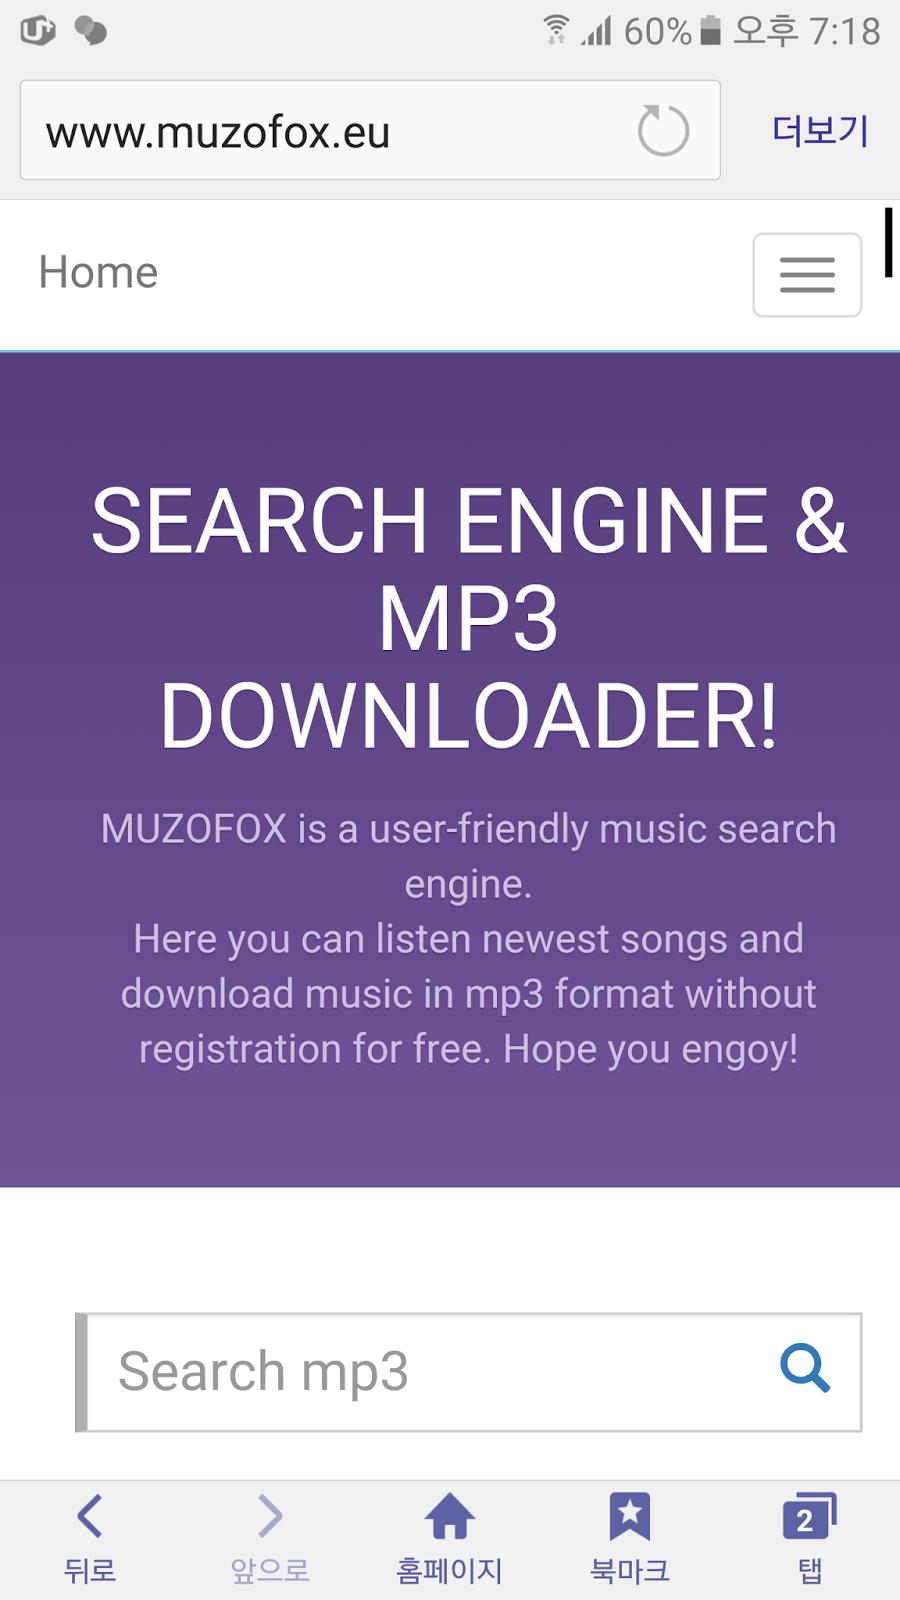 muzofox